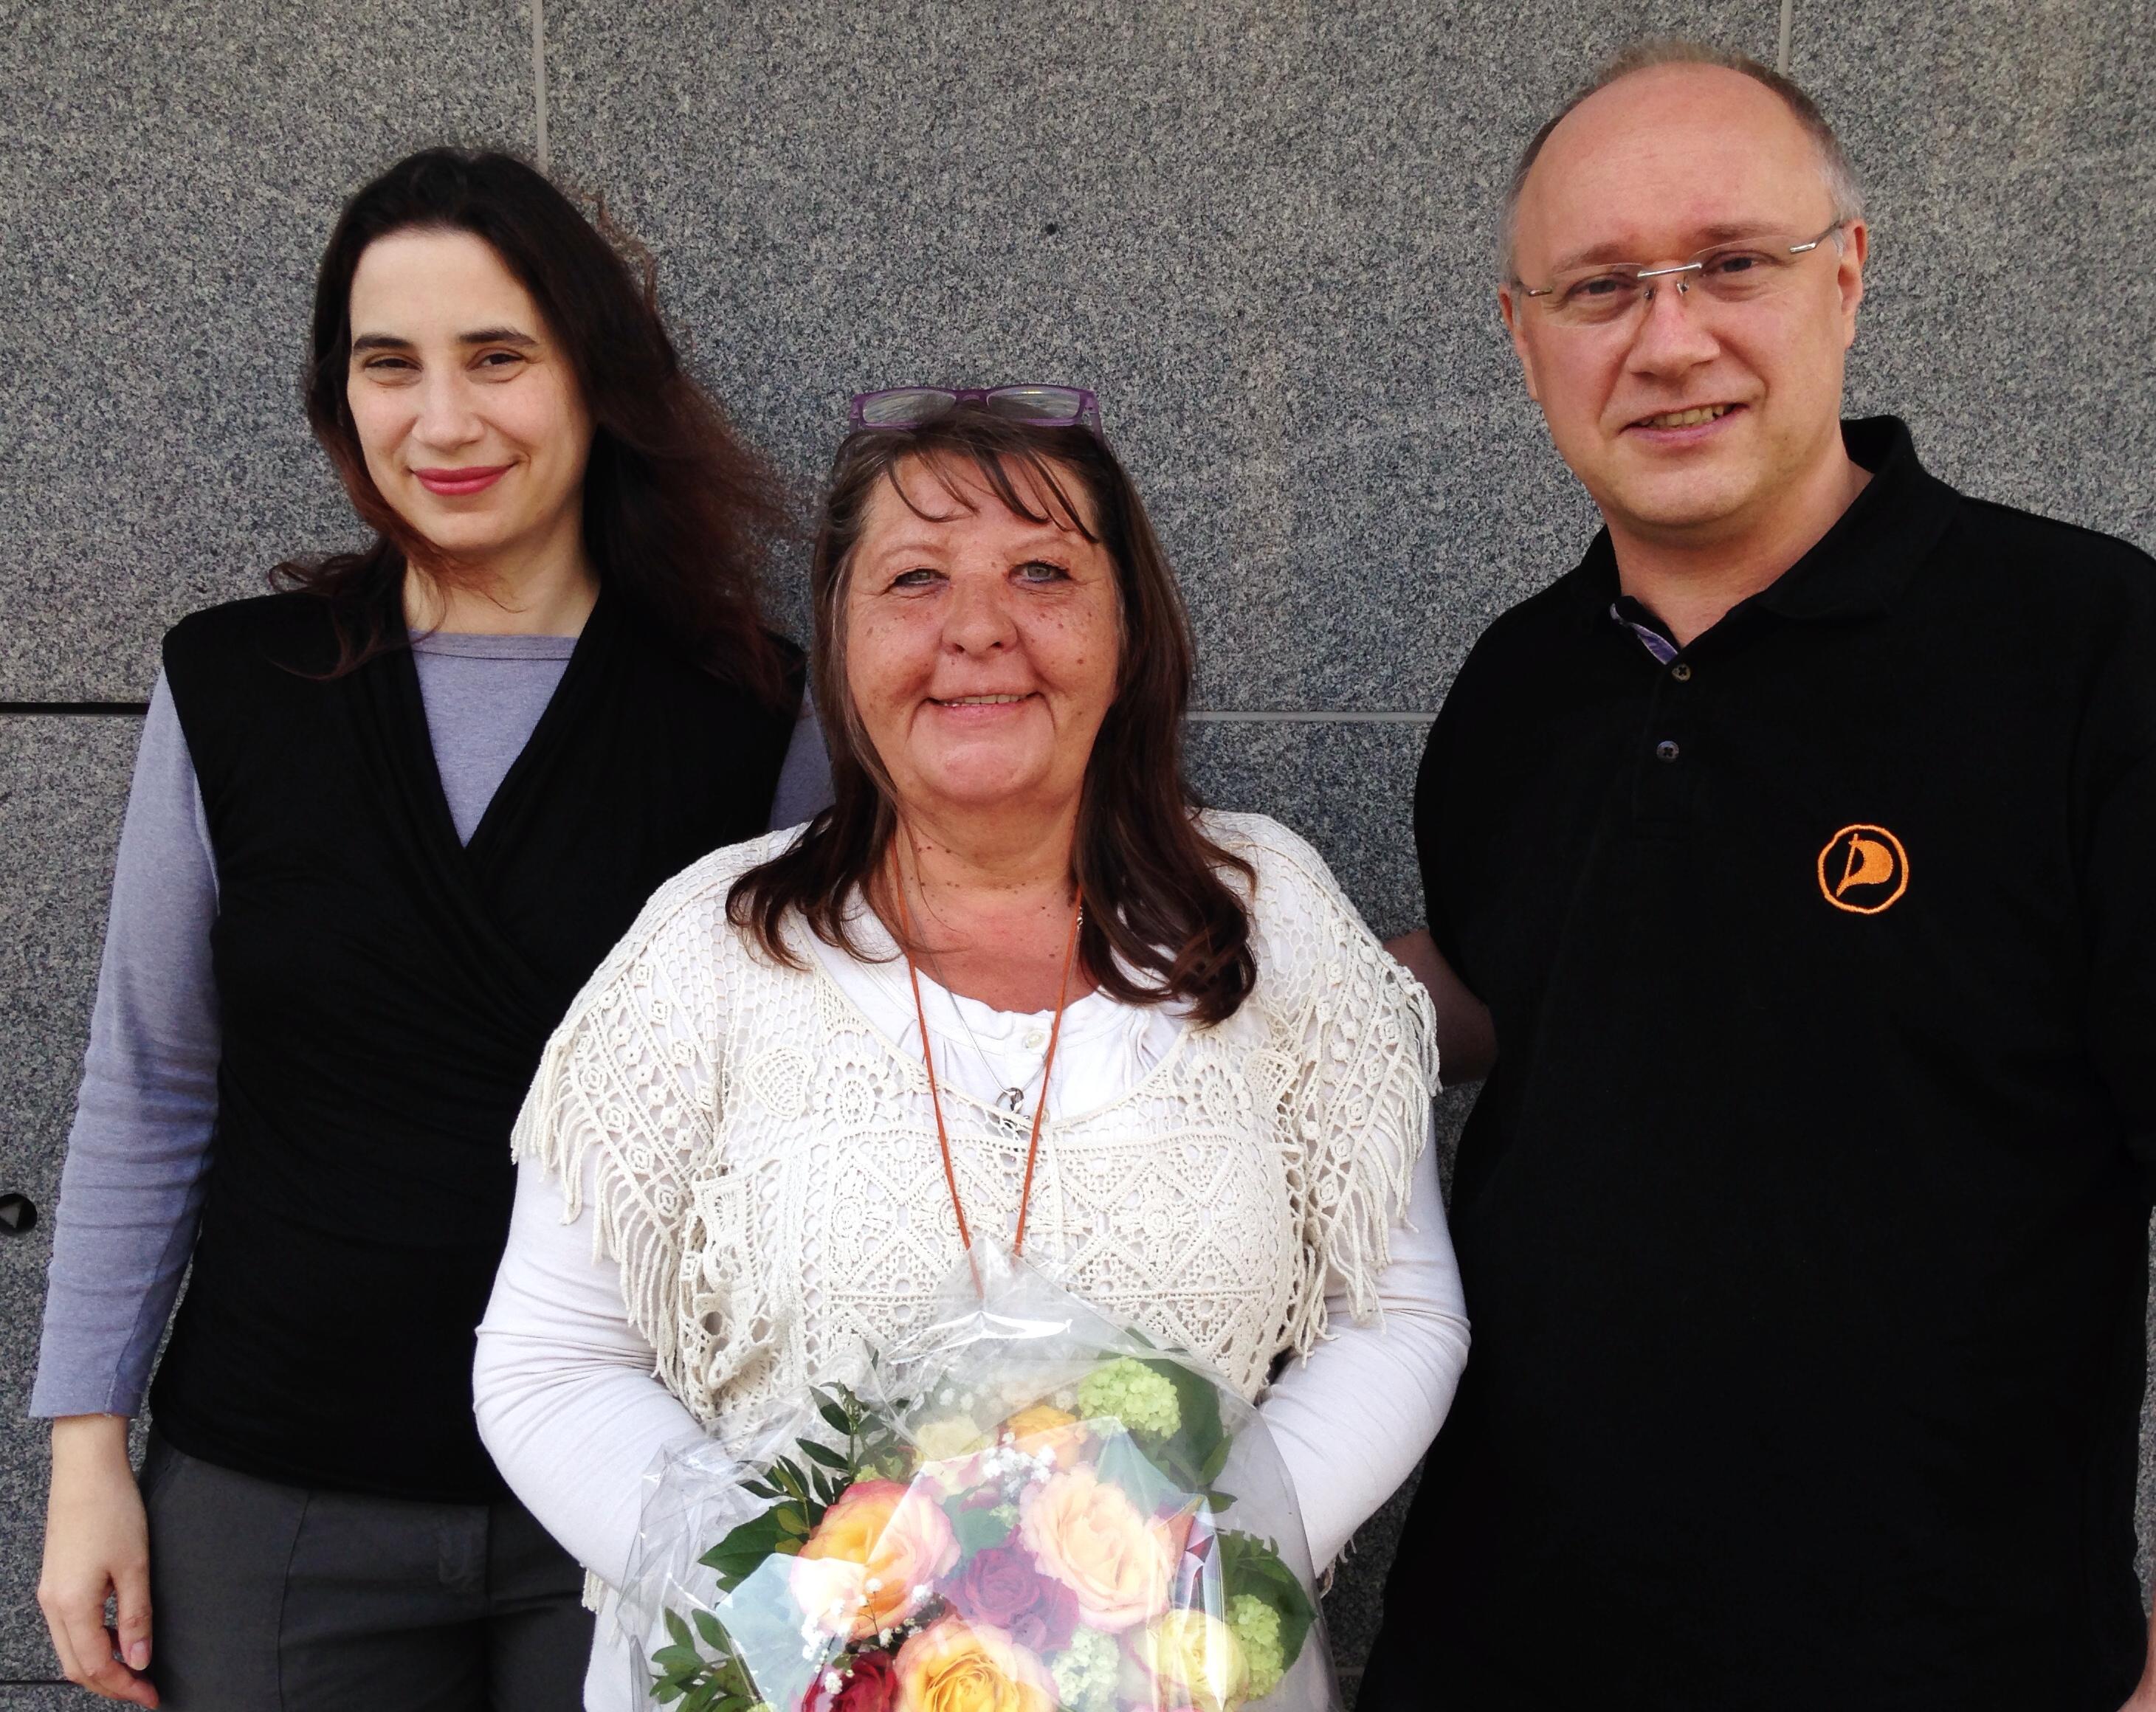 Vorstand der Krefelder Piraten gratuliert Sandra Leurs zur Oberbürgermeisterkandidatur.